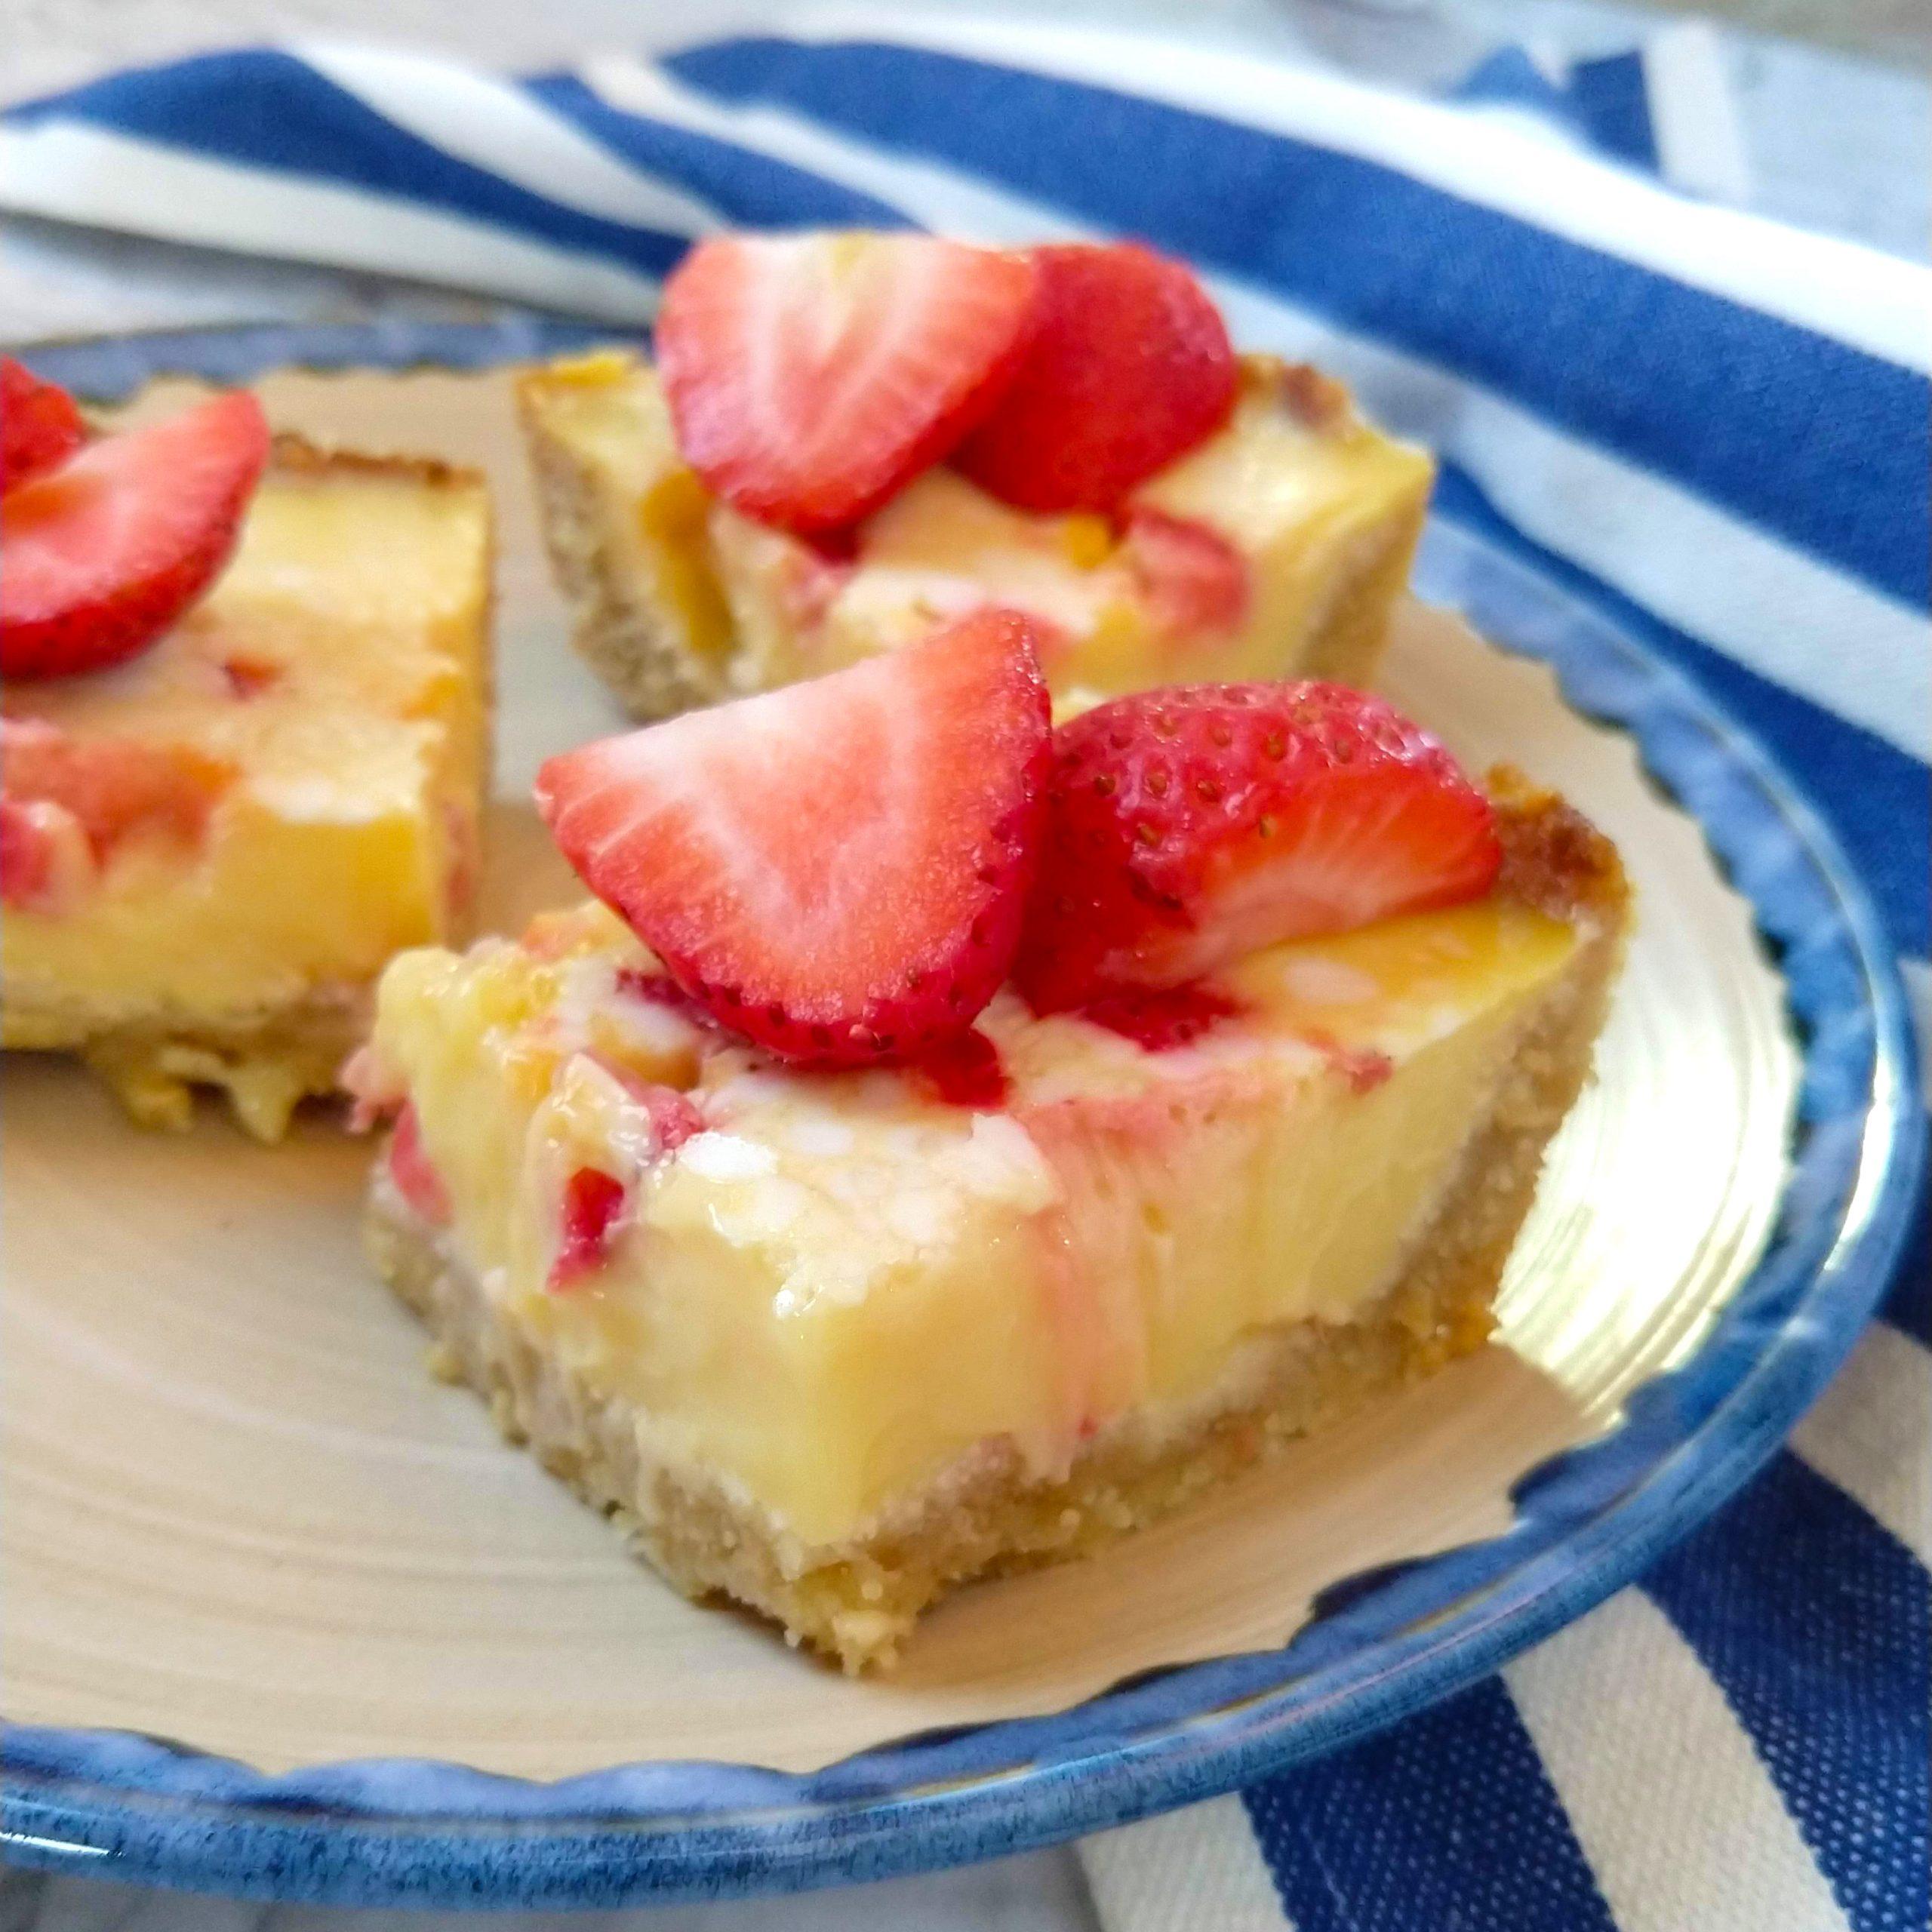 Strawberry Lemonade Bars (Dairy free + Keto & Paleo options)